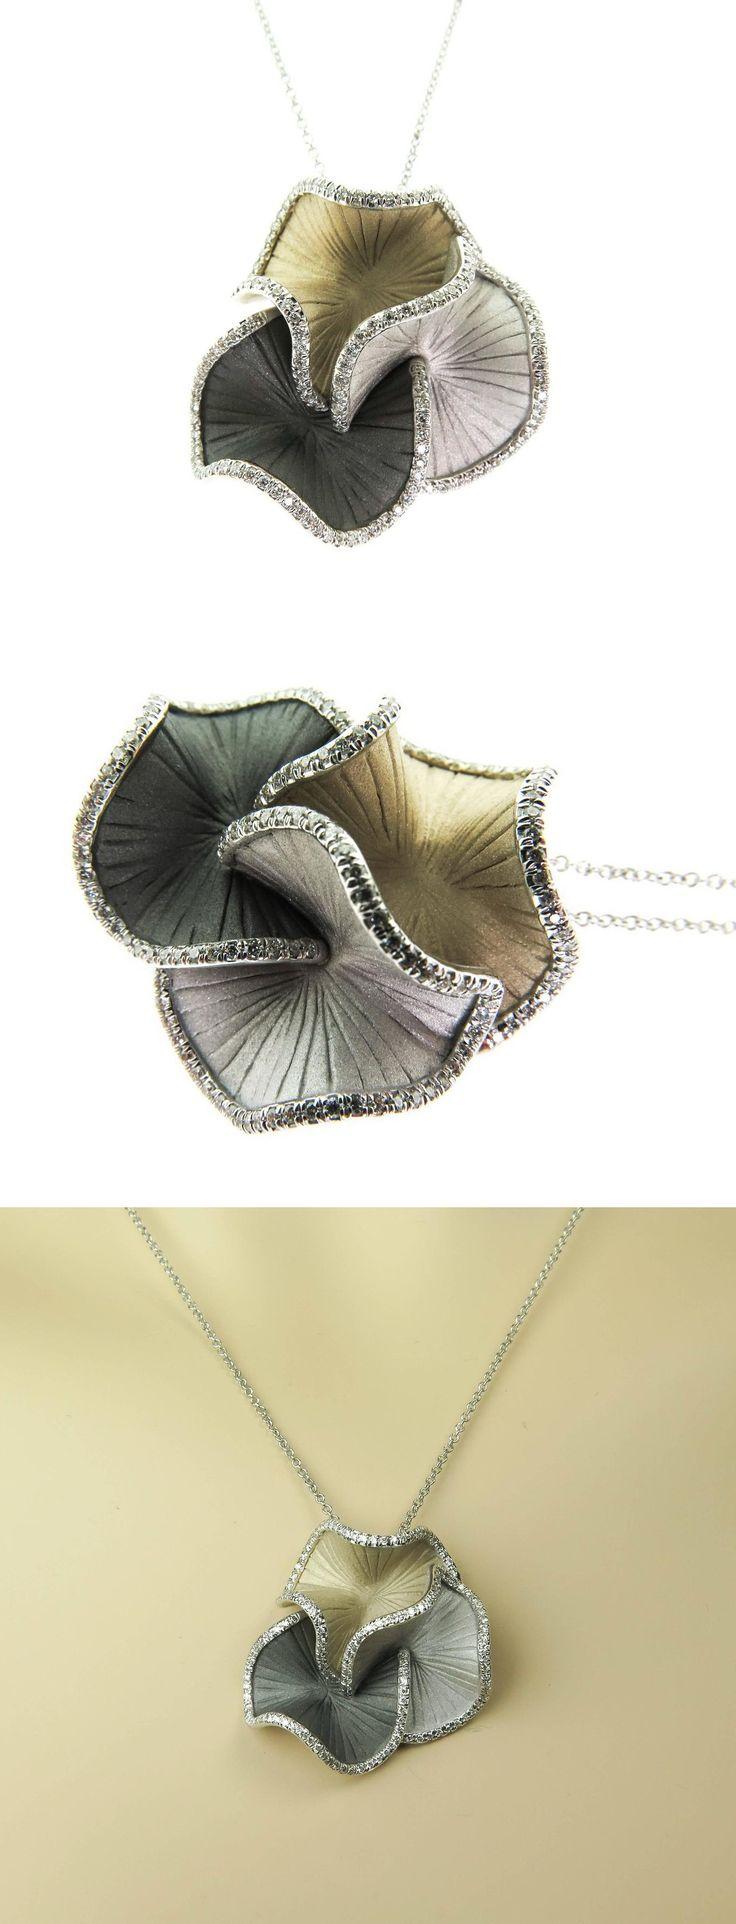 Annamaria Cammilli Diamond Gold Sultana Pendant https://www.1stdibs.com/jewelry/necklaces/chain-necklaces/diamond-gold-sultana-pendant/id-j_1758713/